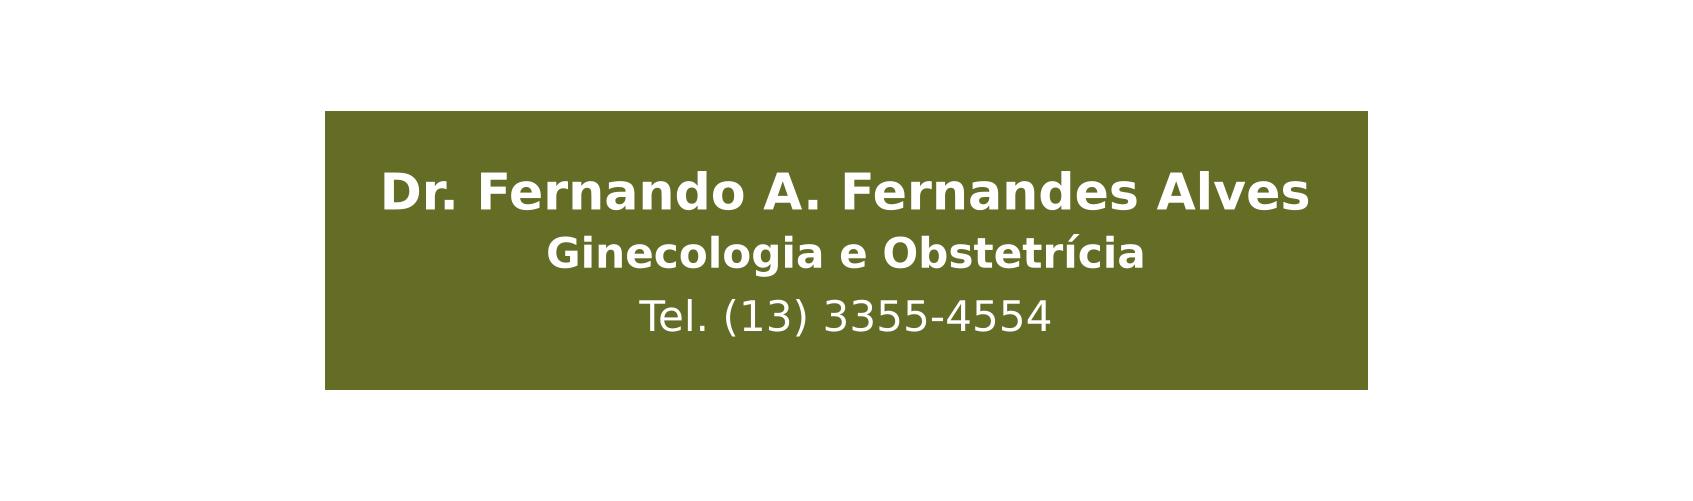 parceiros Fernando Fernandes 170818